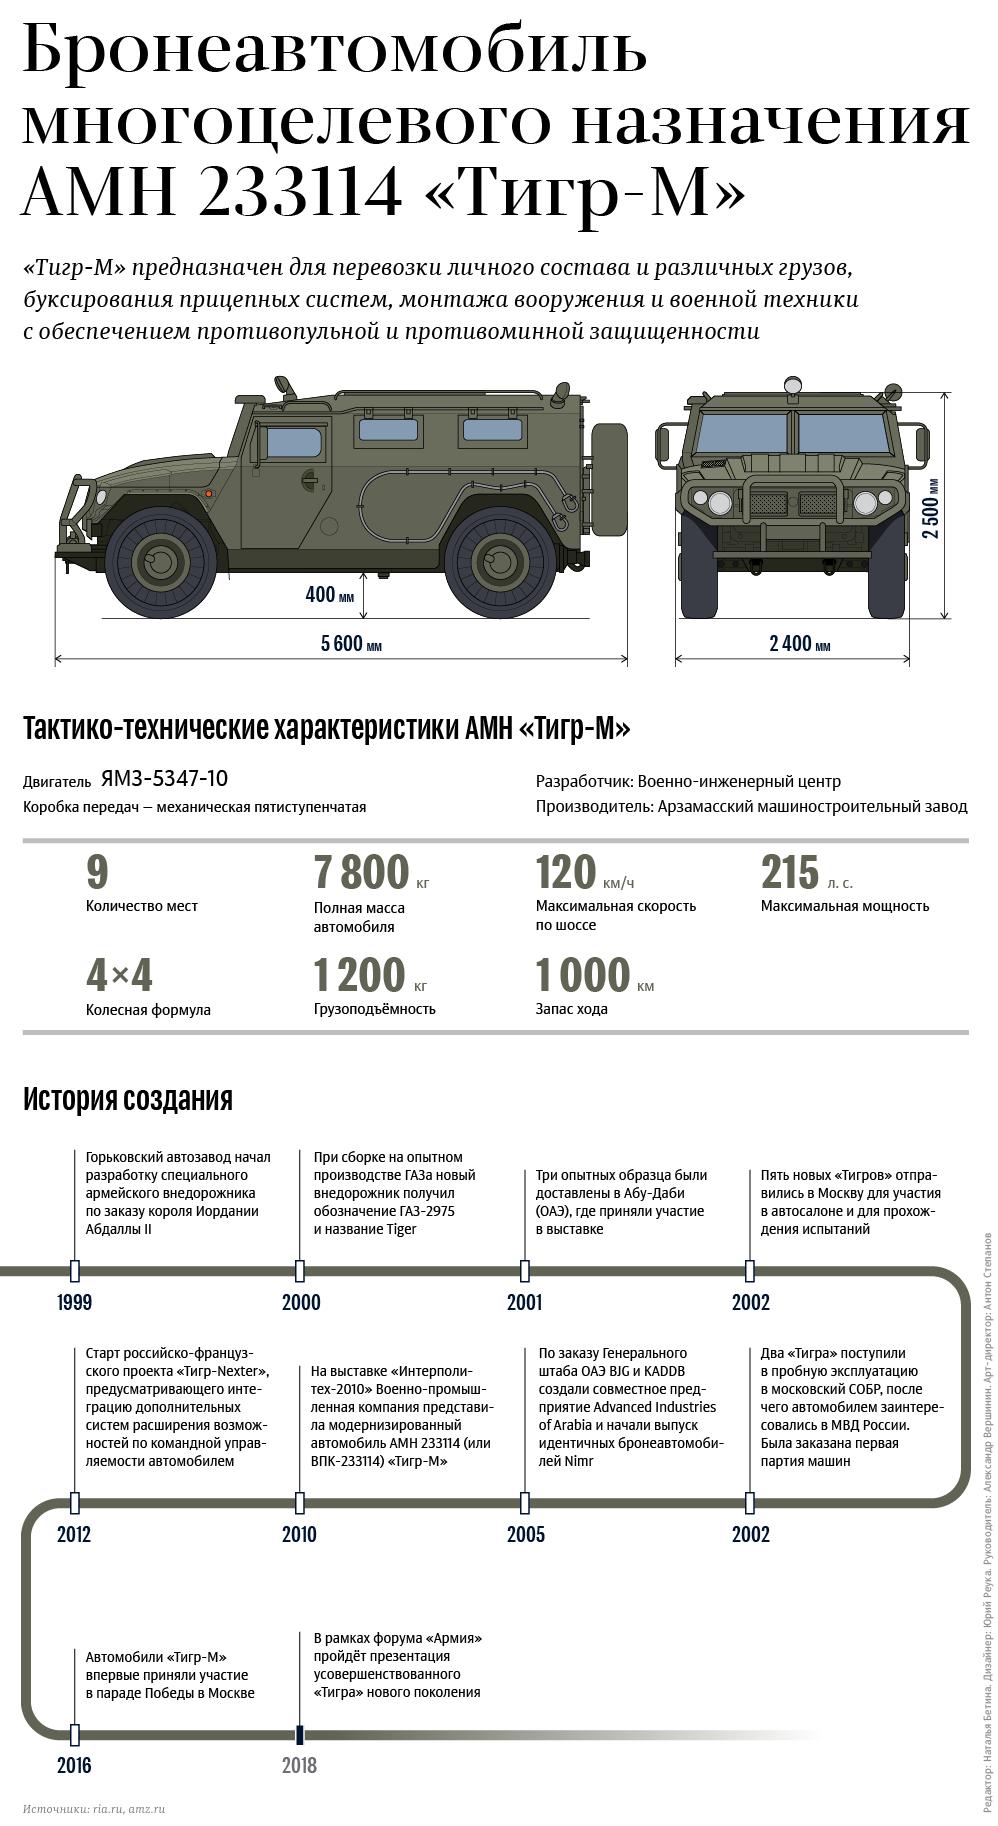 Бронеавтомобиль многоцелевого назначения АМН 233114 «Тигр-М»